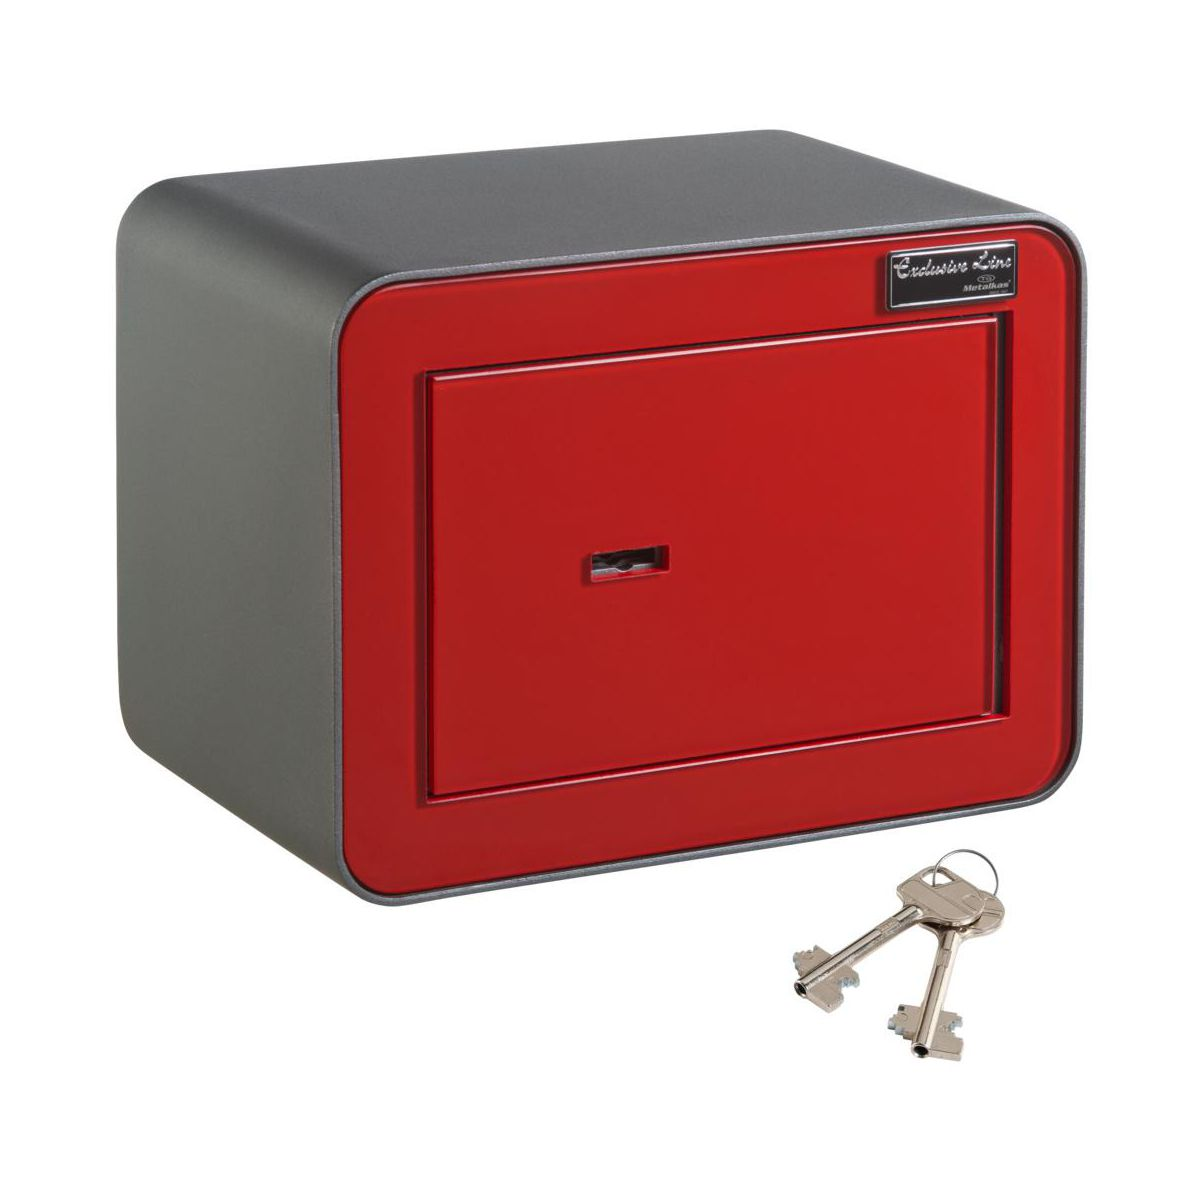 sejf tg slm2classic szyba czerwona metalkas sejfy w. Black Bedroom Furniture Sets. Home Design Ideas